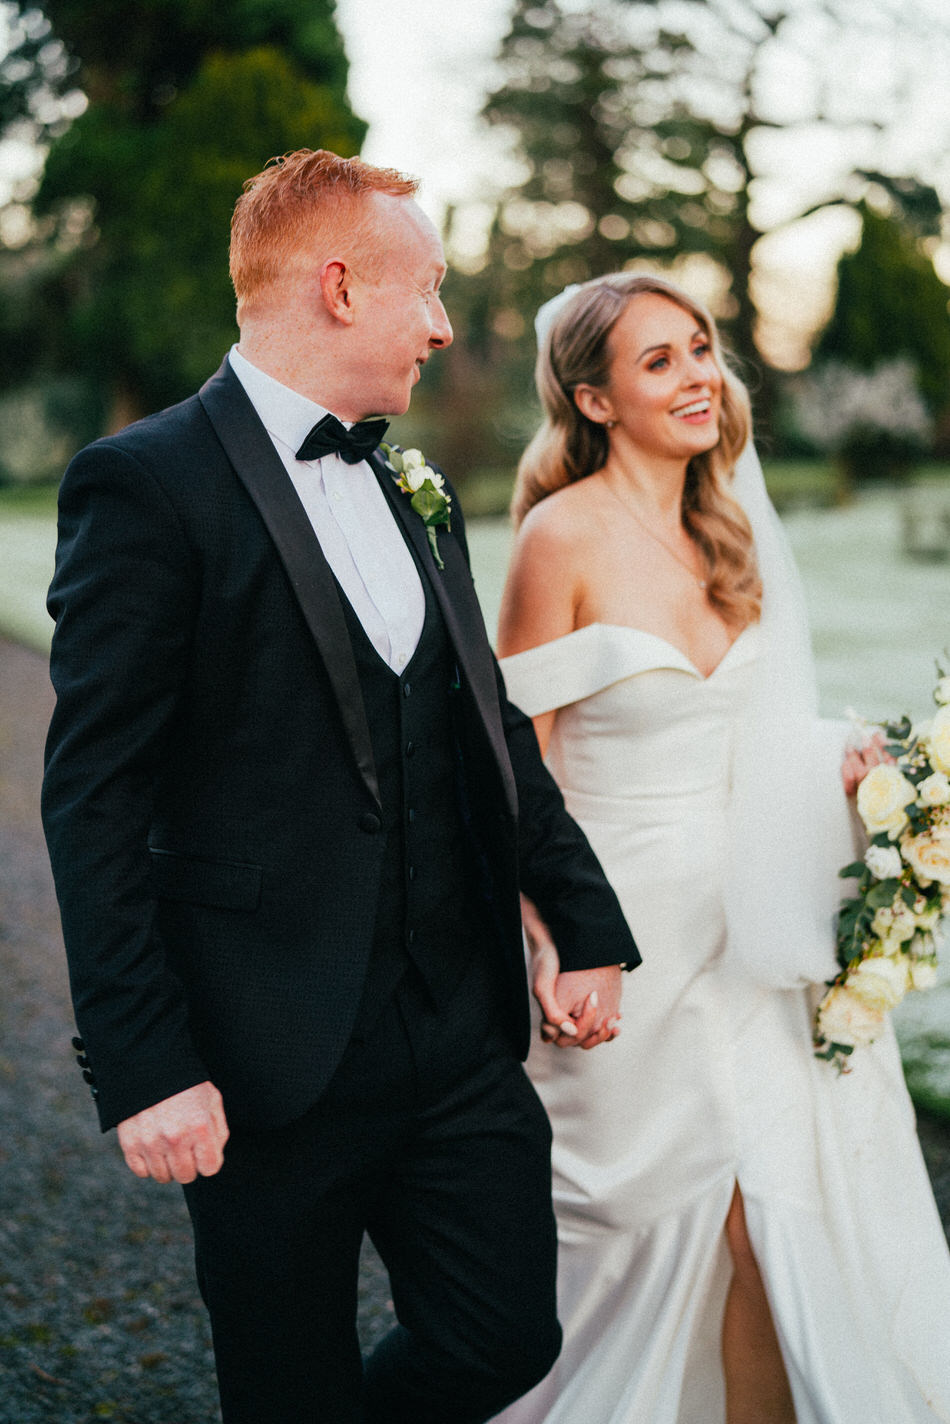 Castle-wedding-ireland-photos- 0219 159